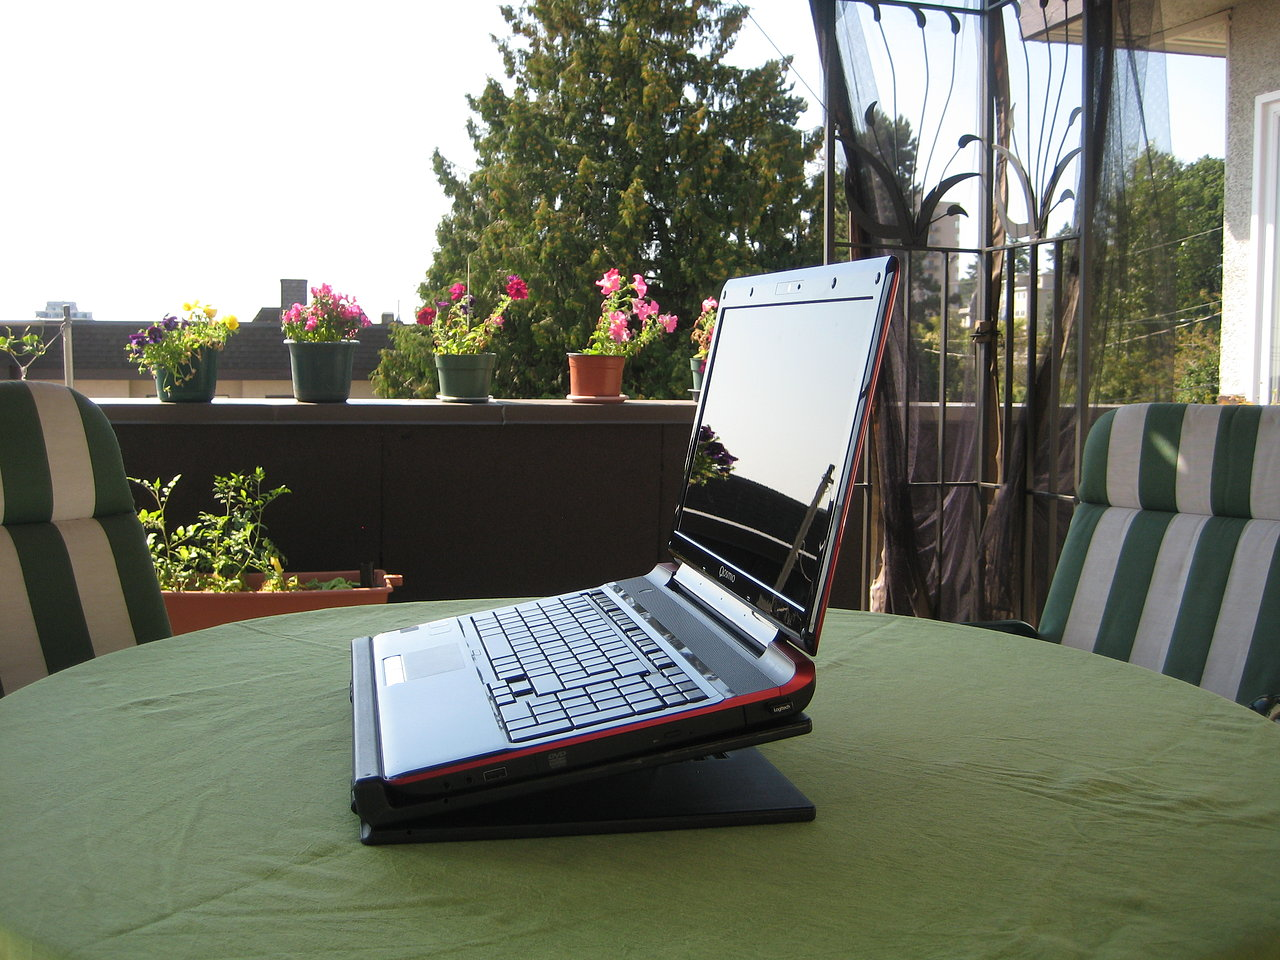 Laptop/Netbook Holder